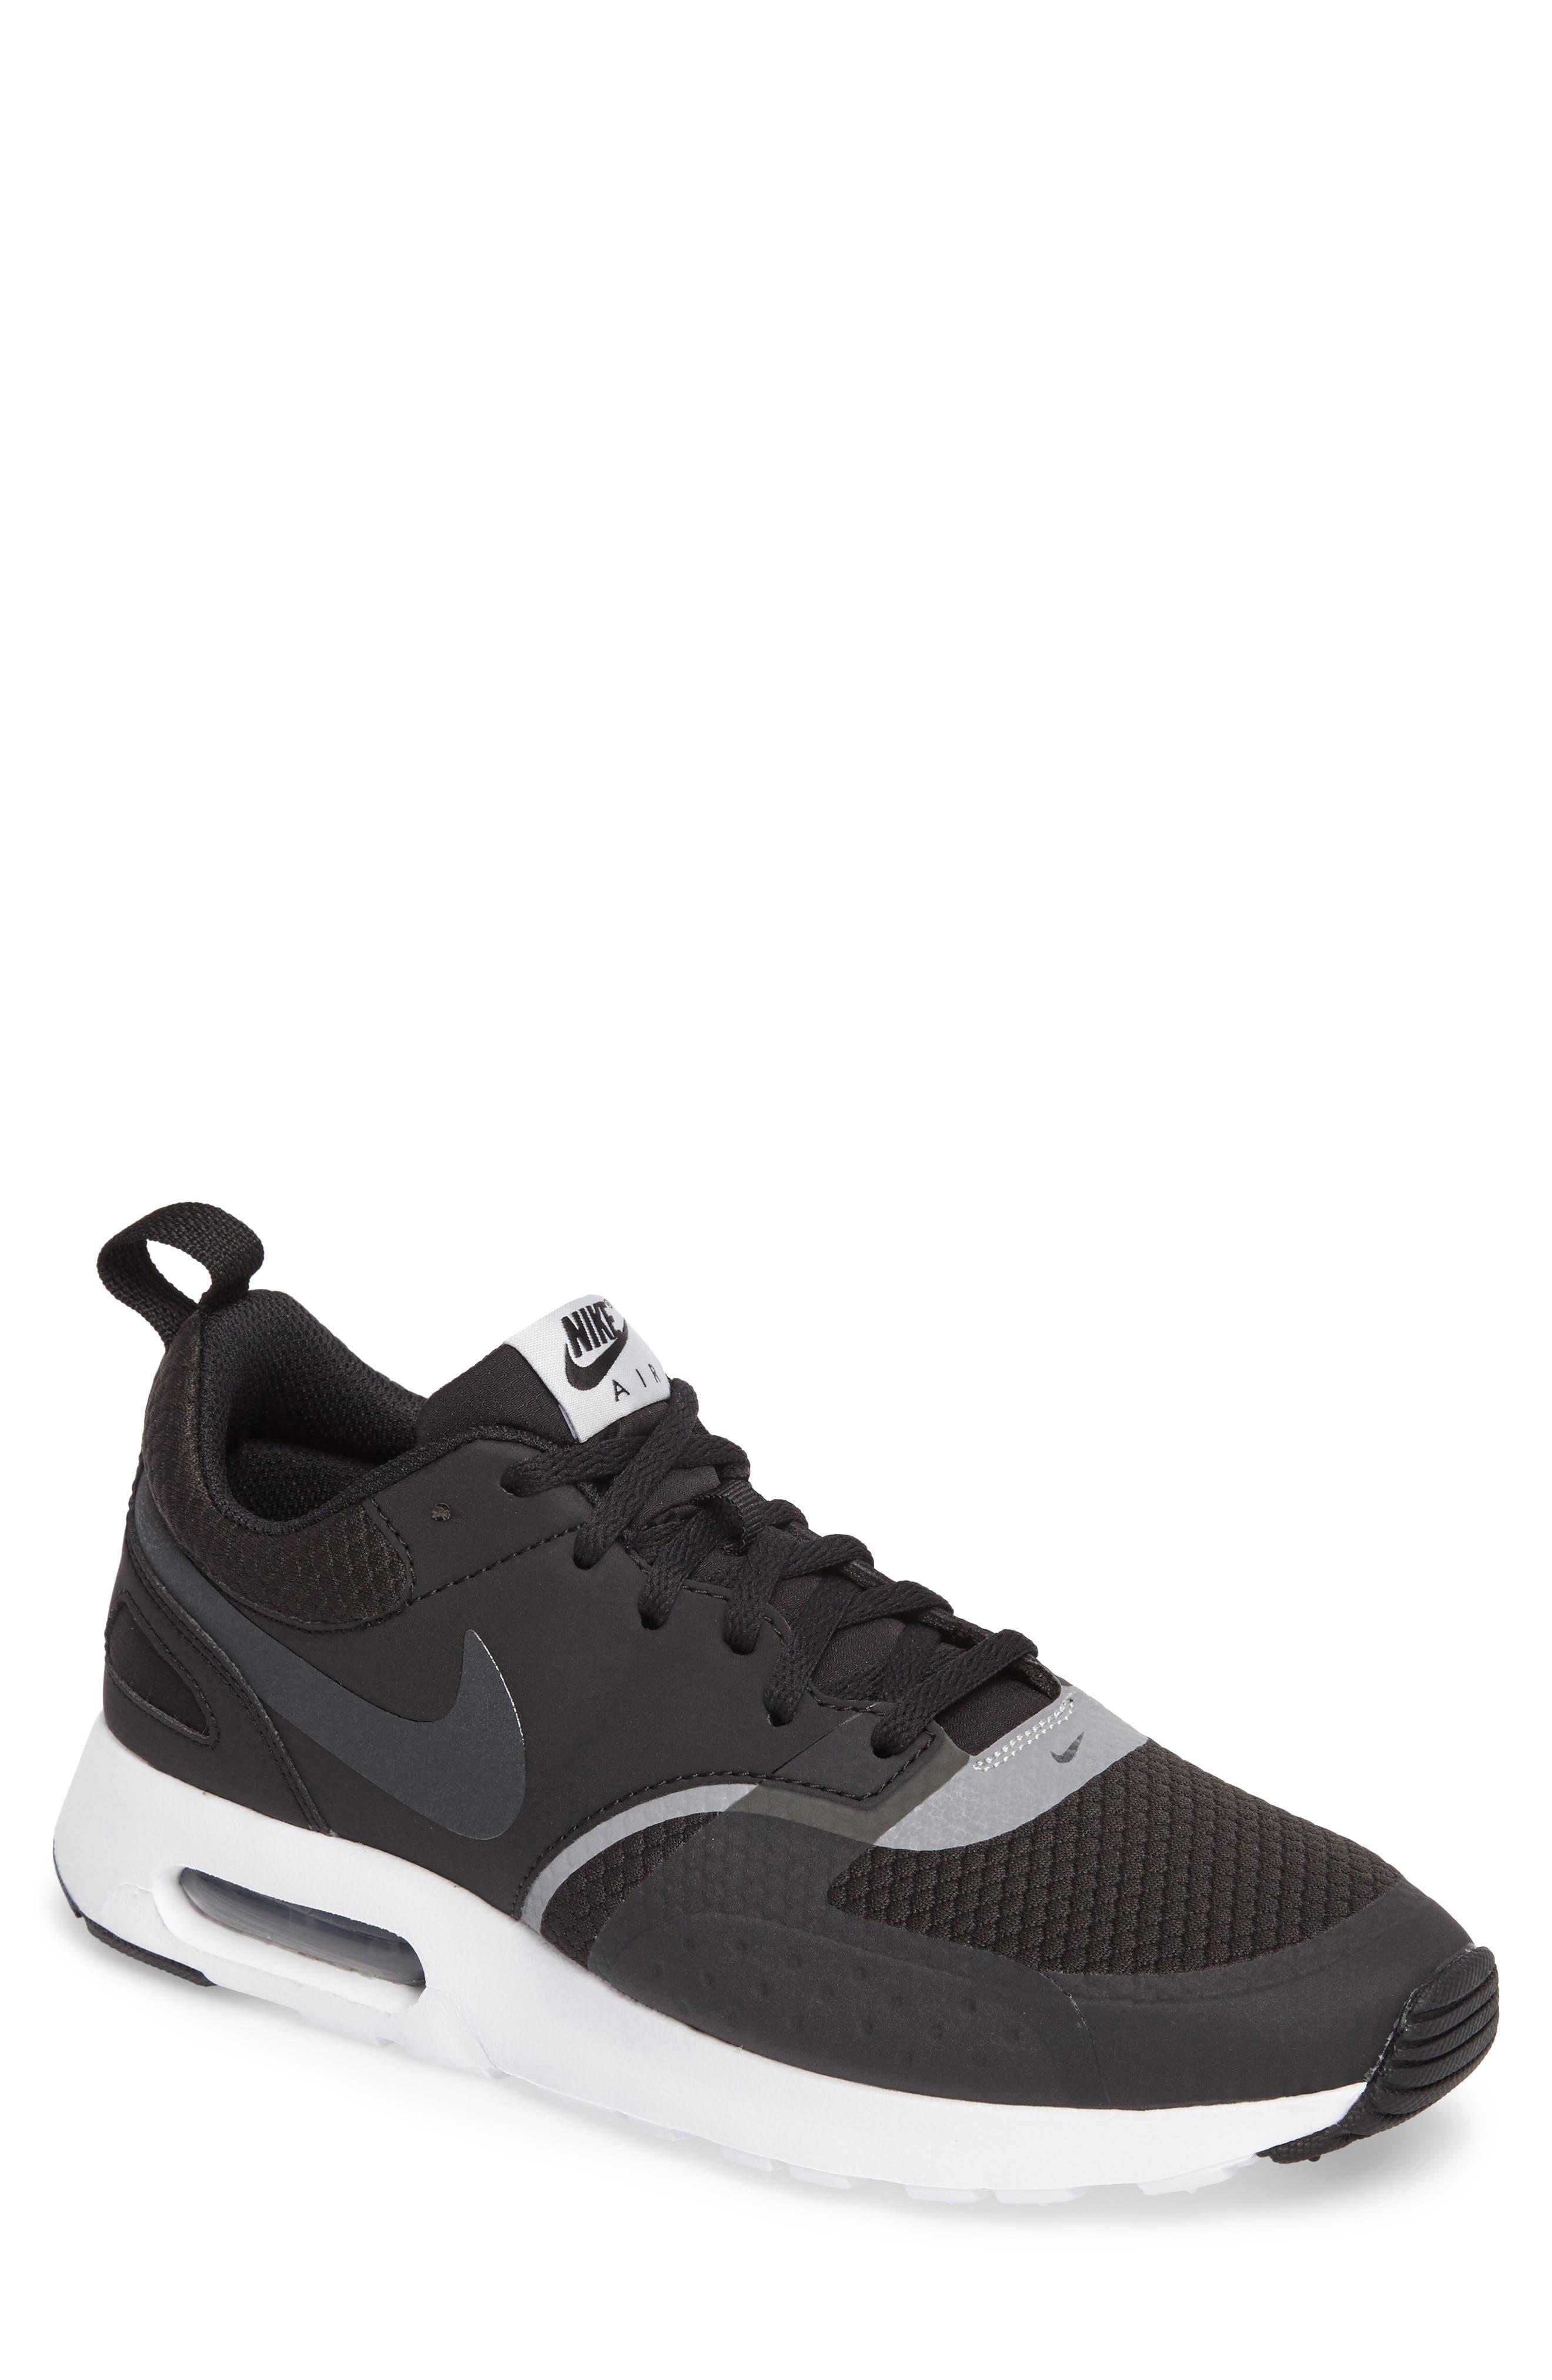 Air Max Vision SE Sneaker,                         Main,                         color, 006